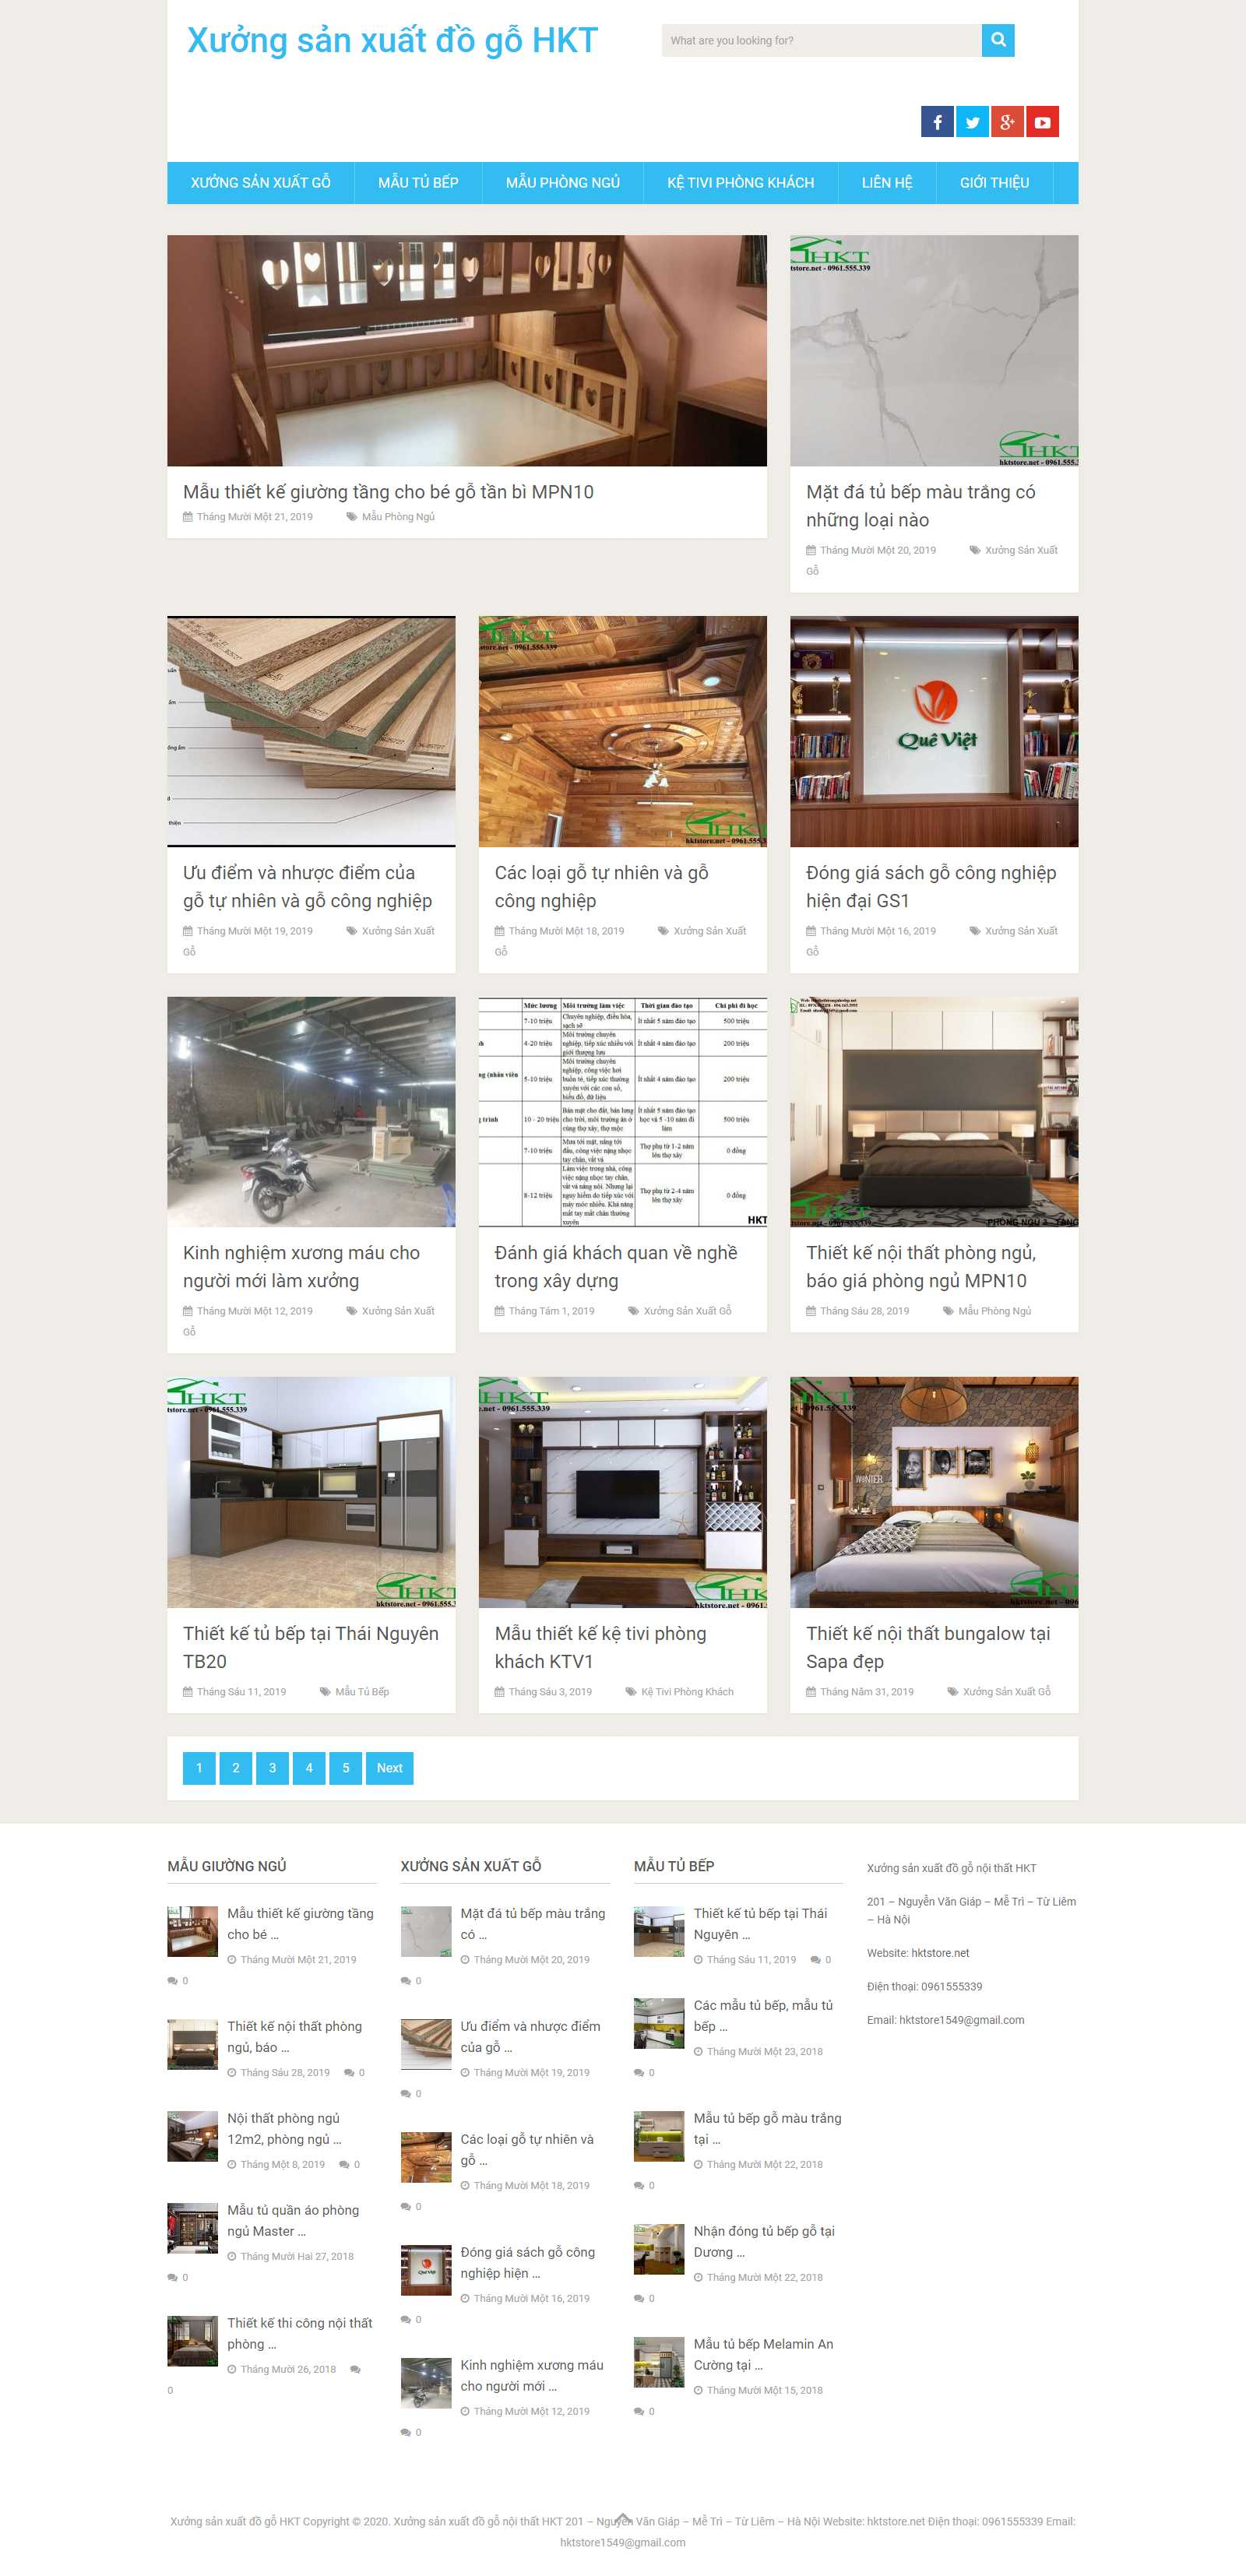 Thiết kế Web Cần Thơ - hktstore.net